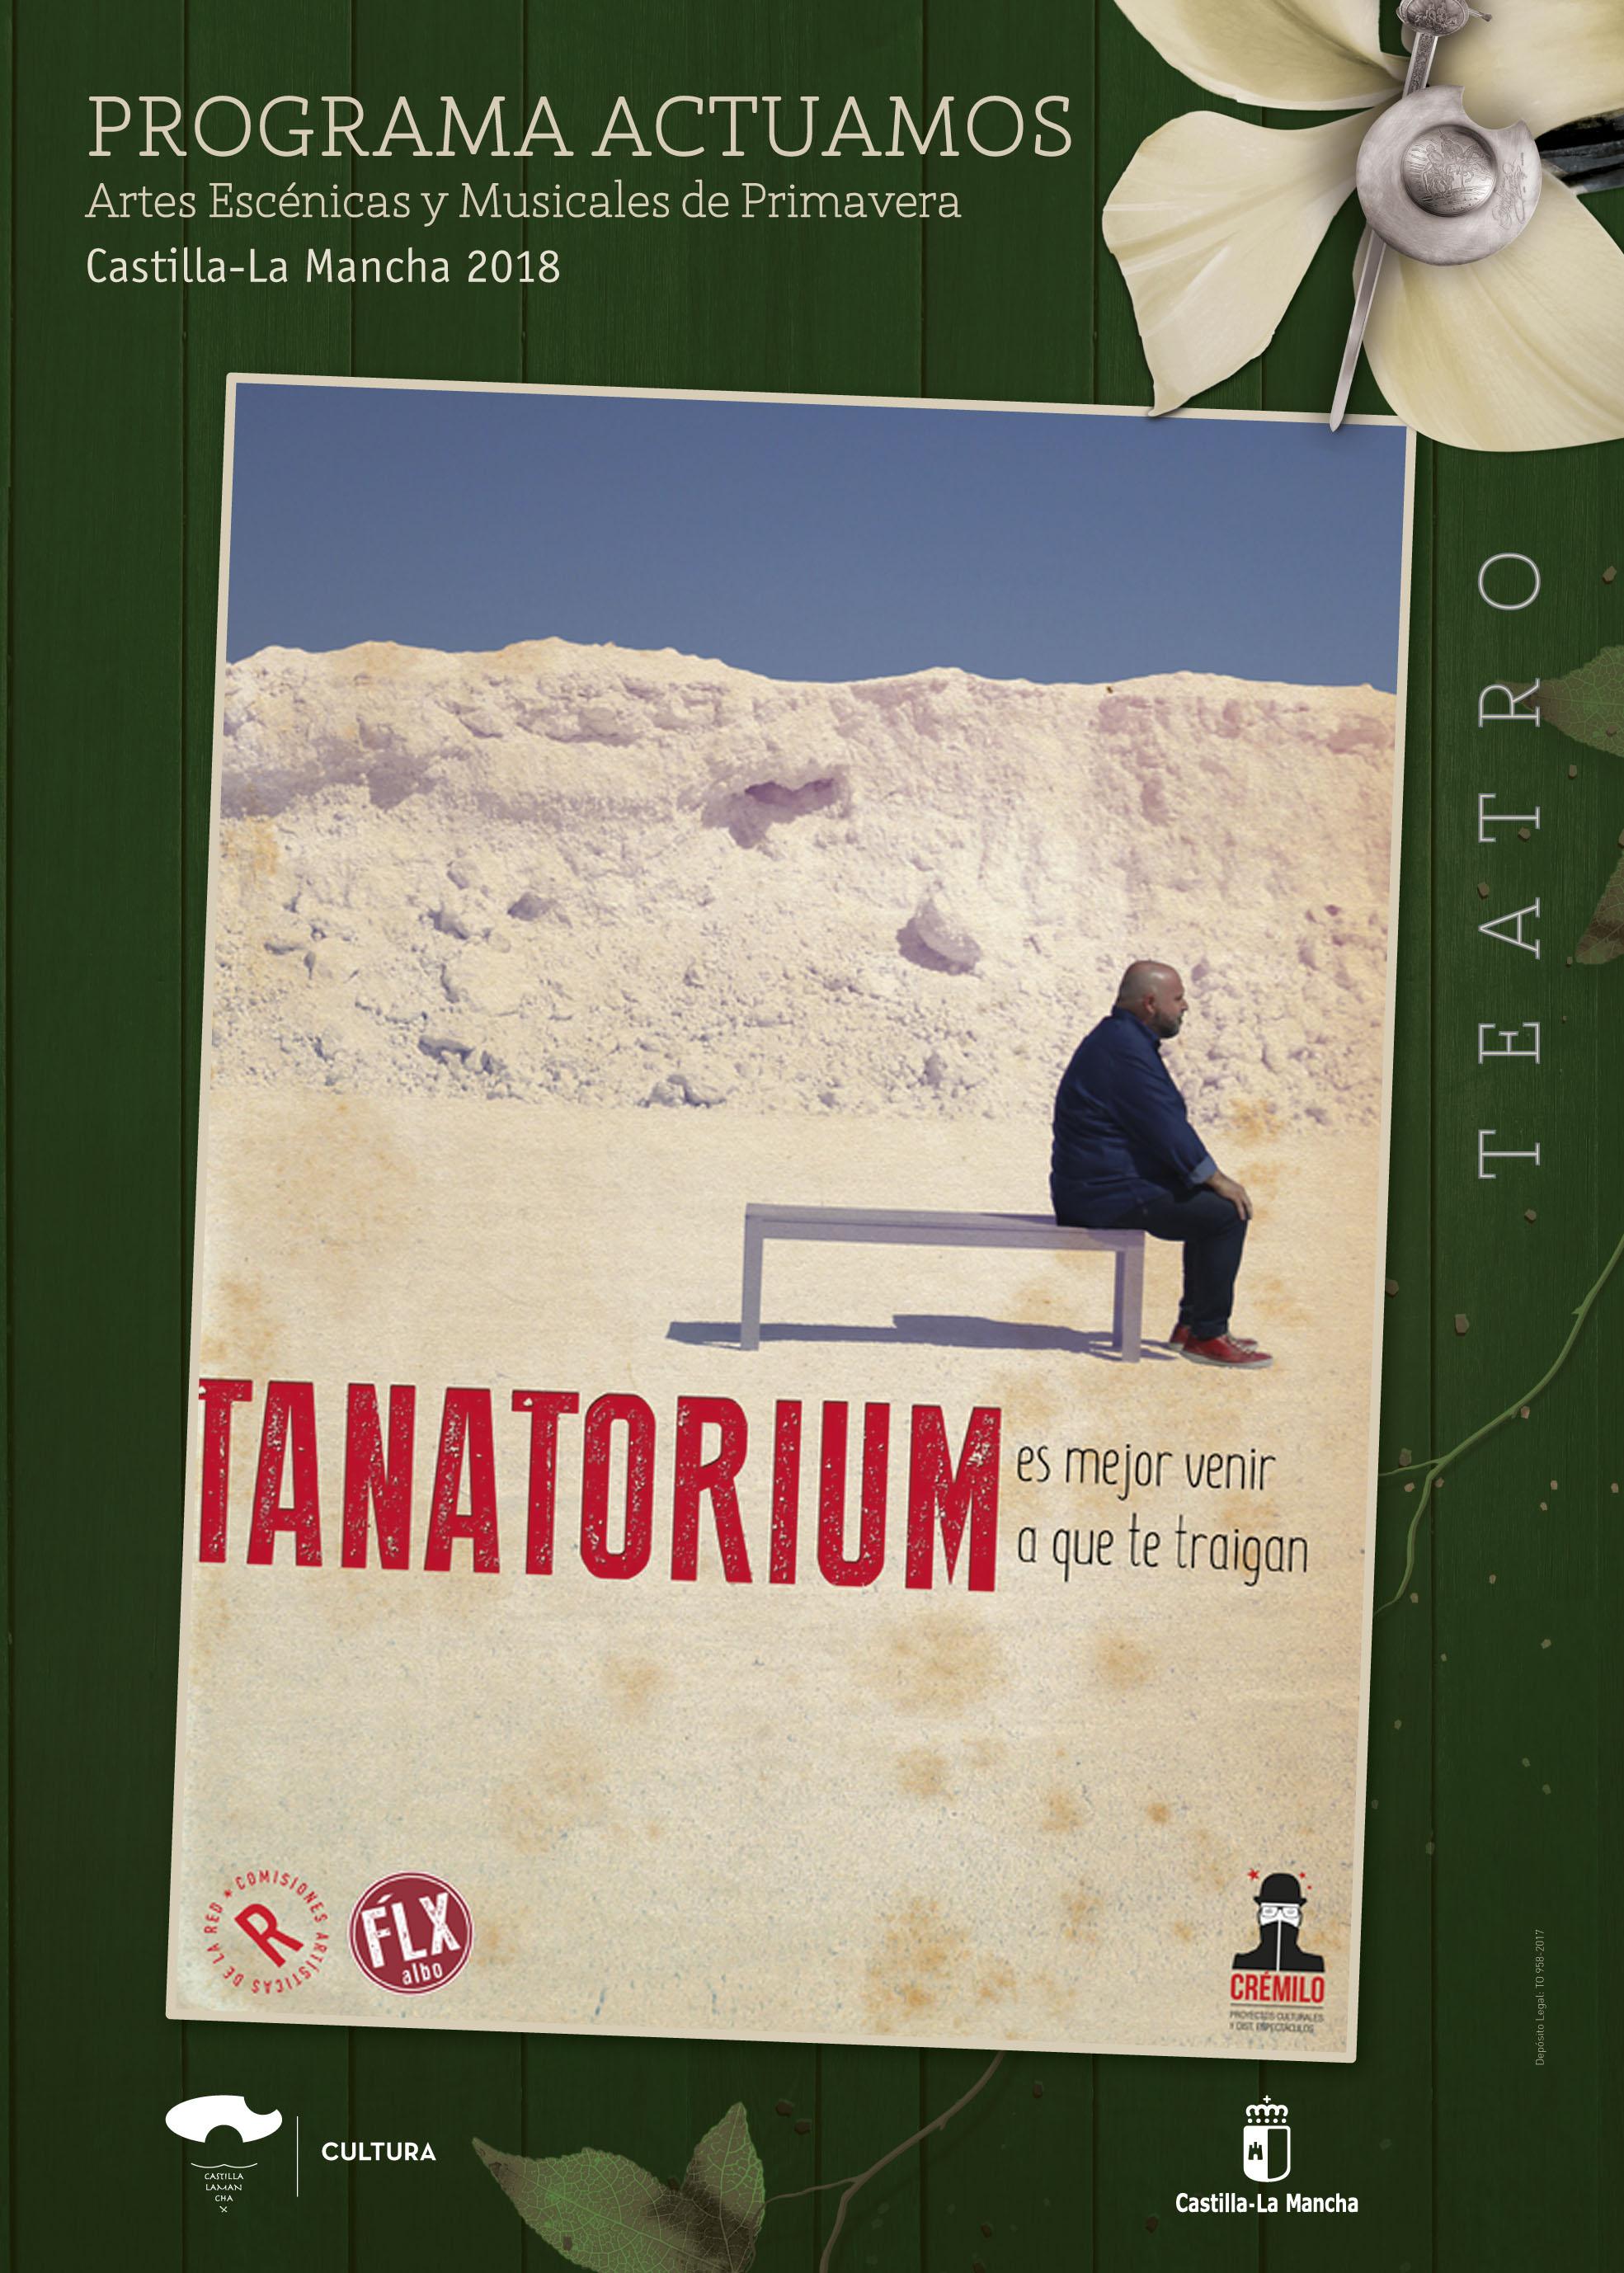 Imagen de la actividad TANATORIUM (Félix Albo)